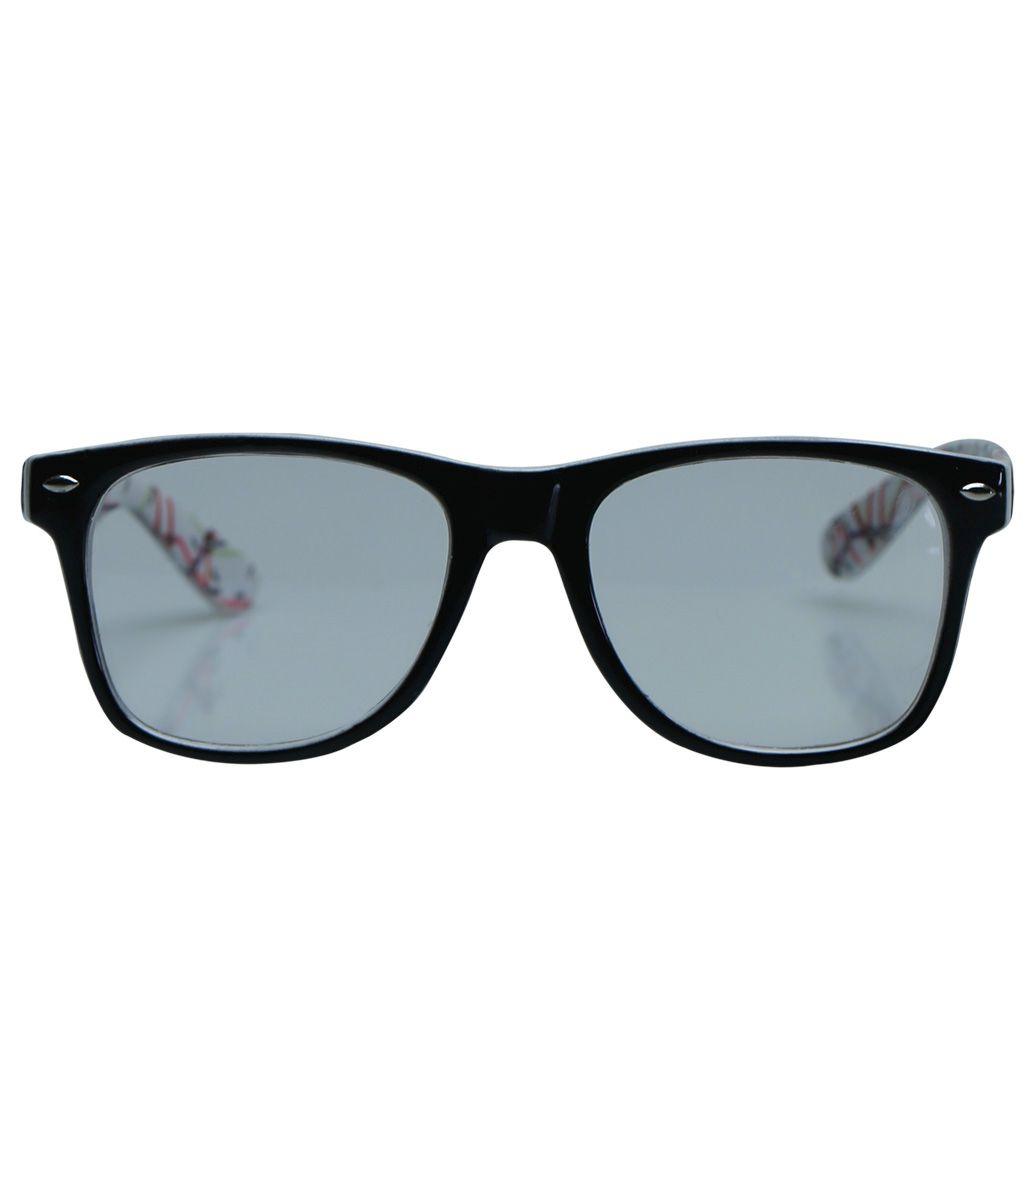 08b93bc6d77f7 Óculos de Sol Unissex Quadrado - Lojas Renner